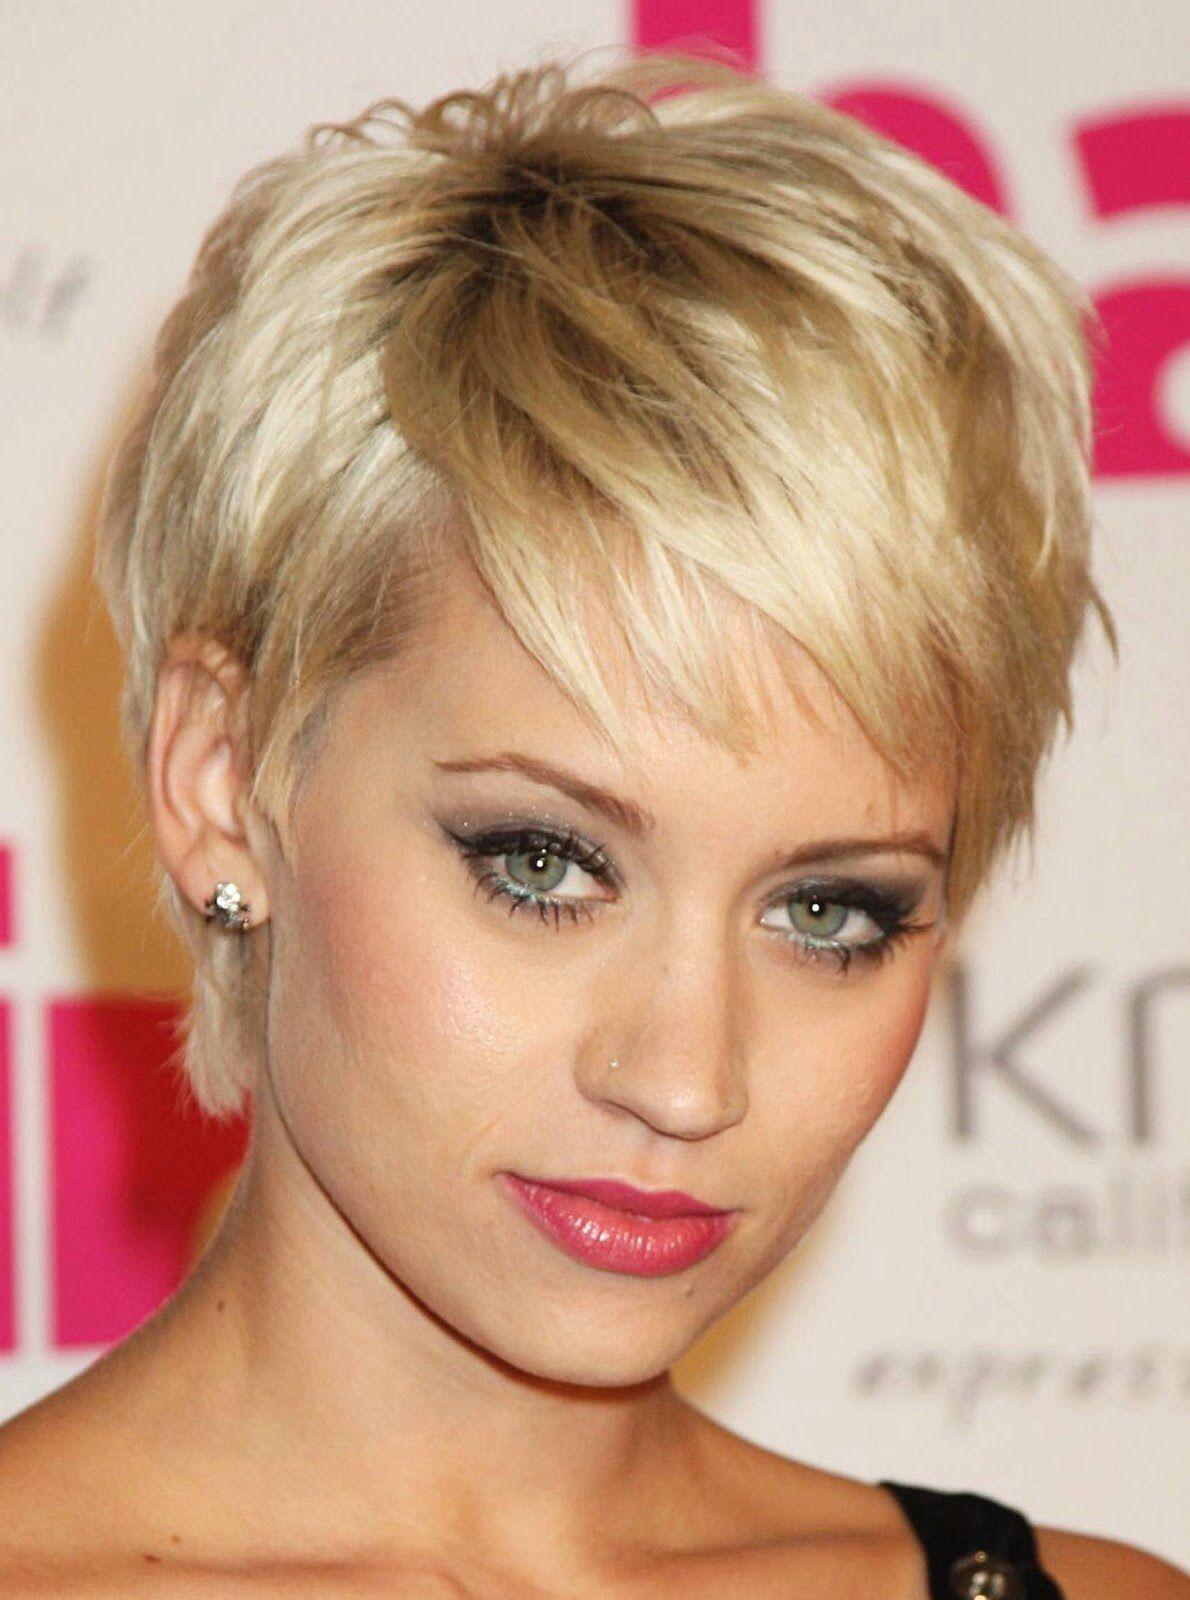 Short blond hair style hair styling pinterest hair style